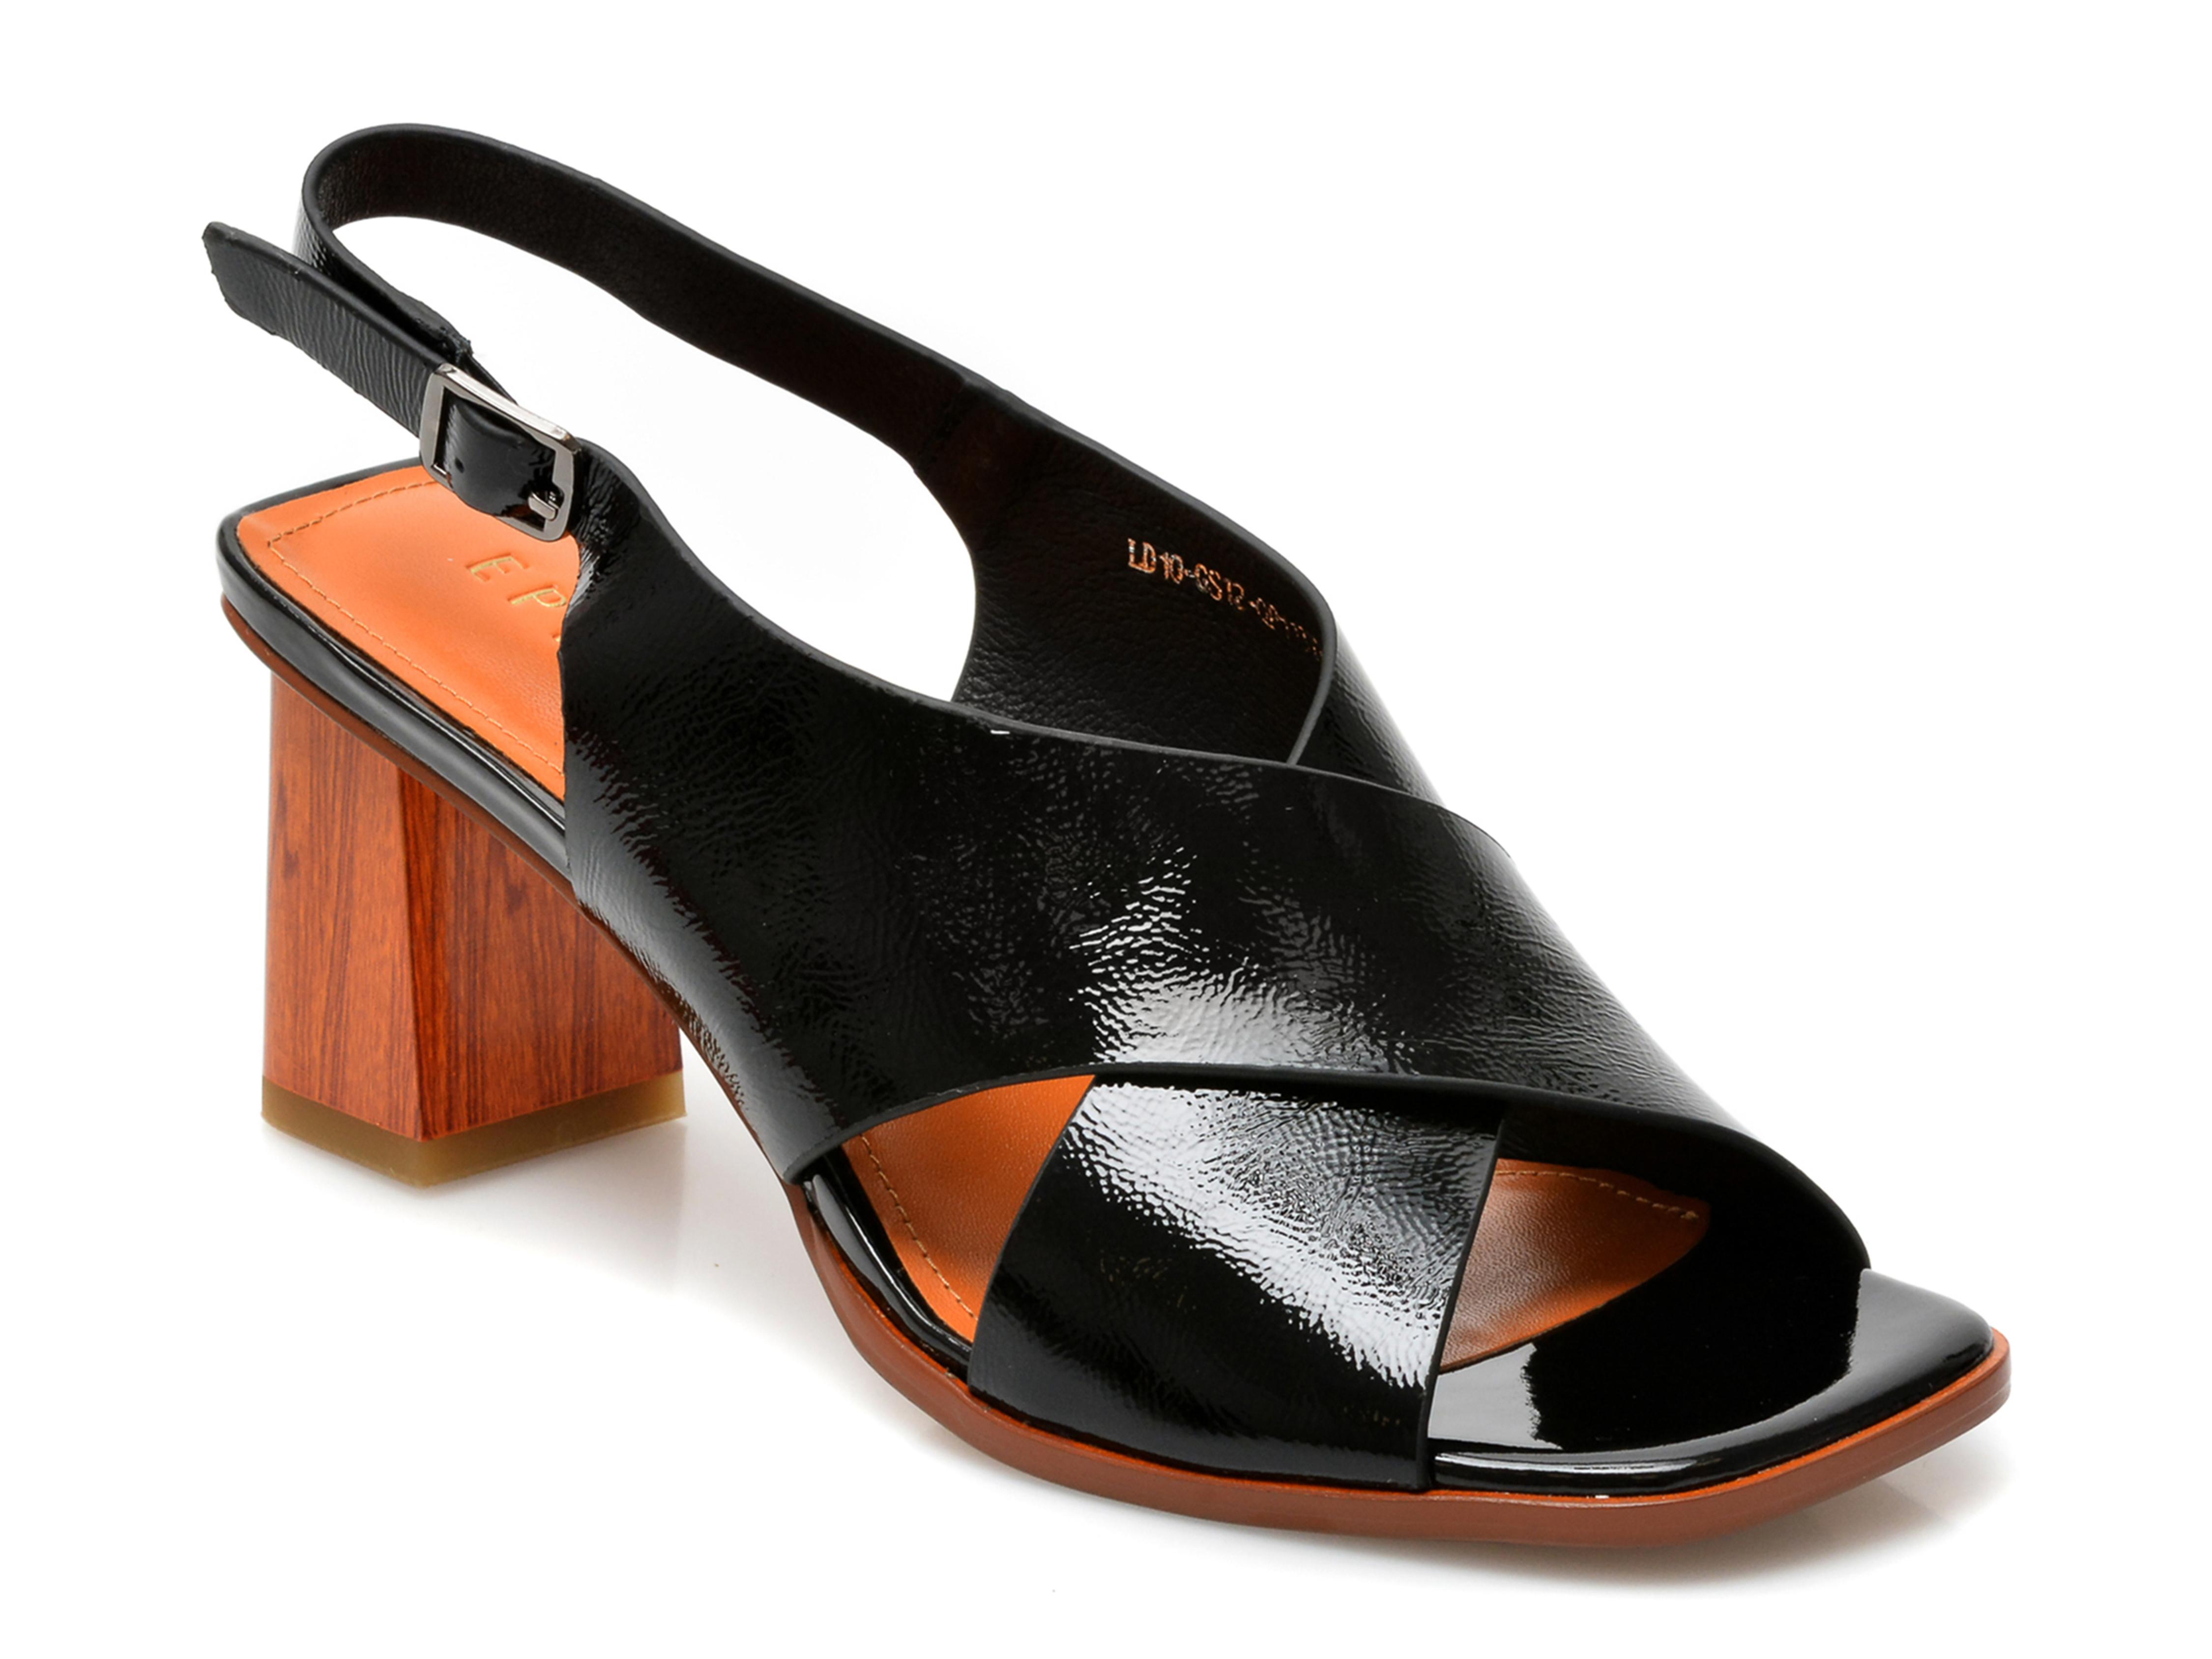 Sandale EPICA negre, LD10GS1, din piele naturala lacuita imagine otter.ro 2021